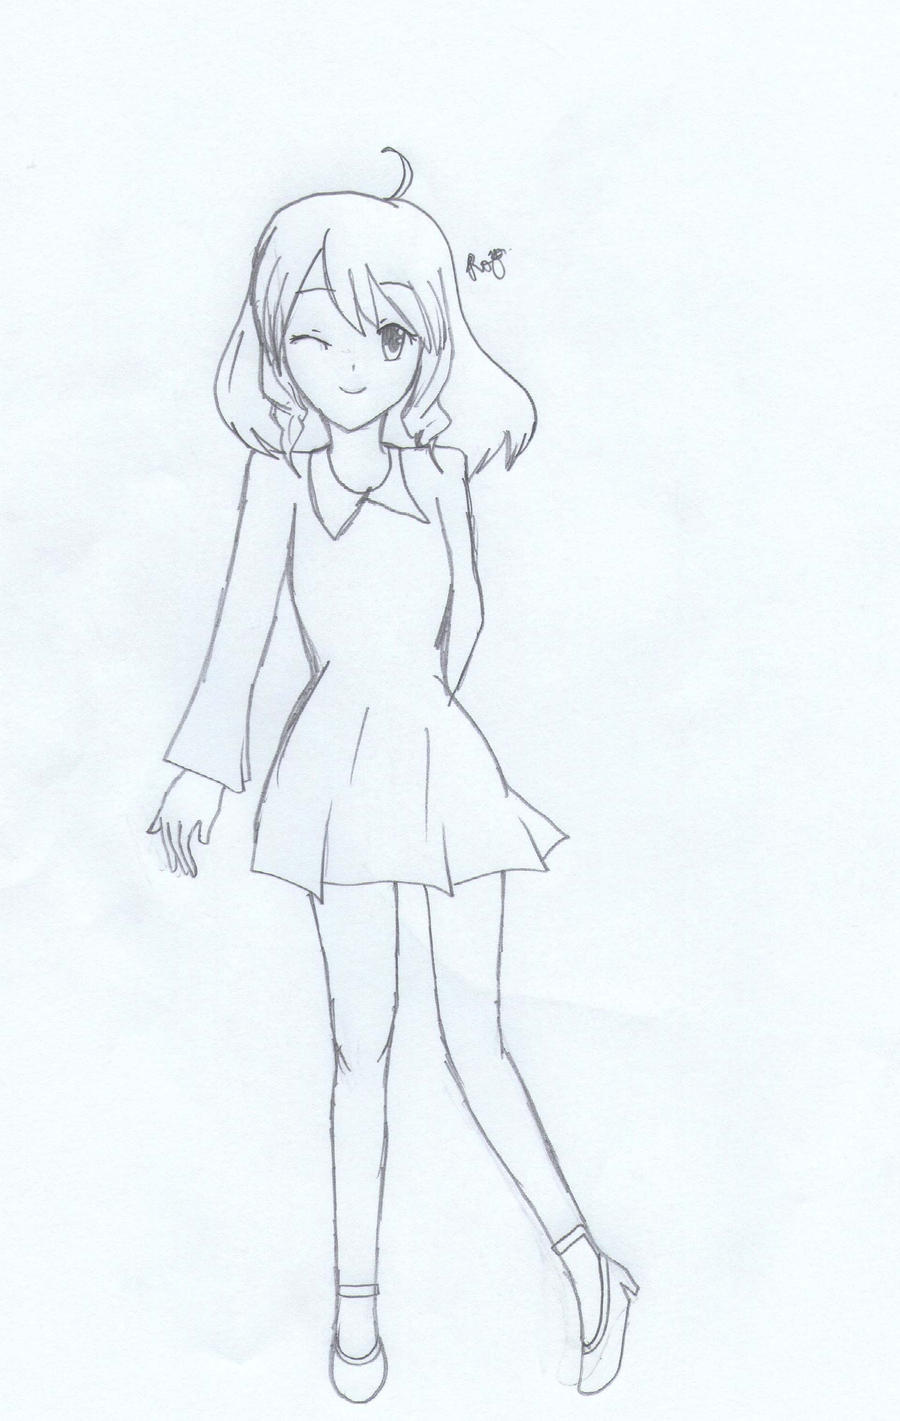 Full body drawing by rinarinsachiko on deviantart